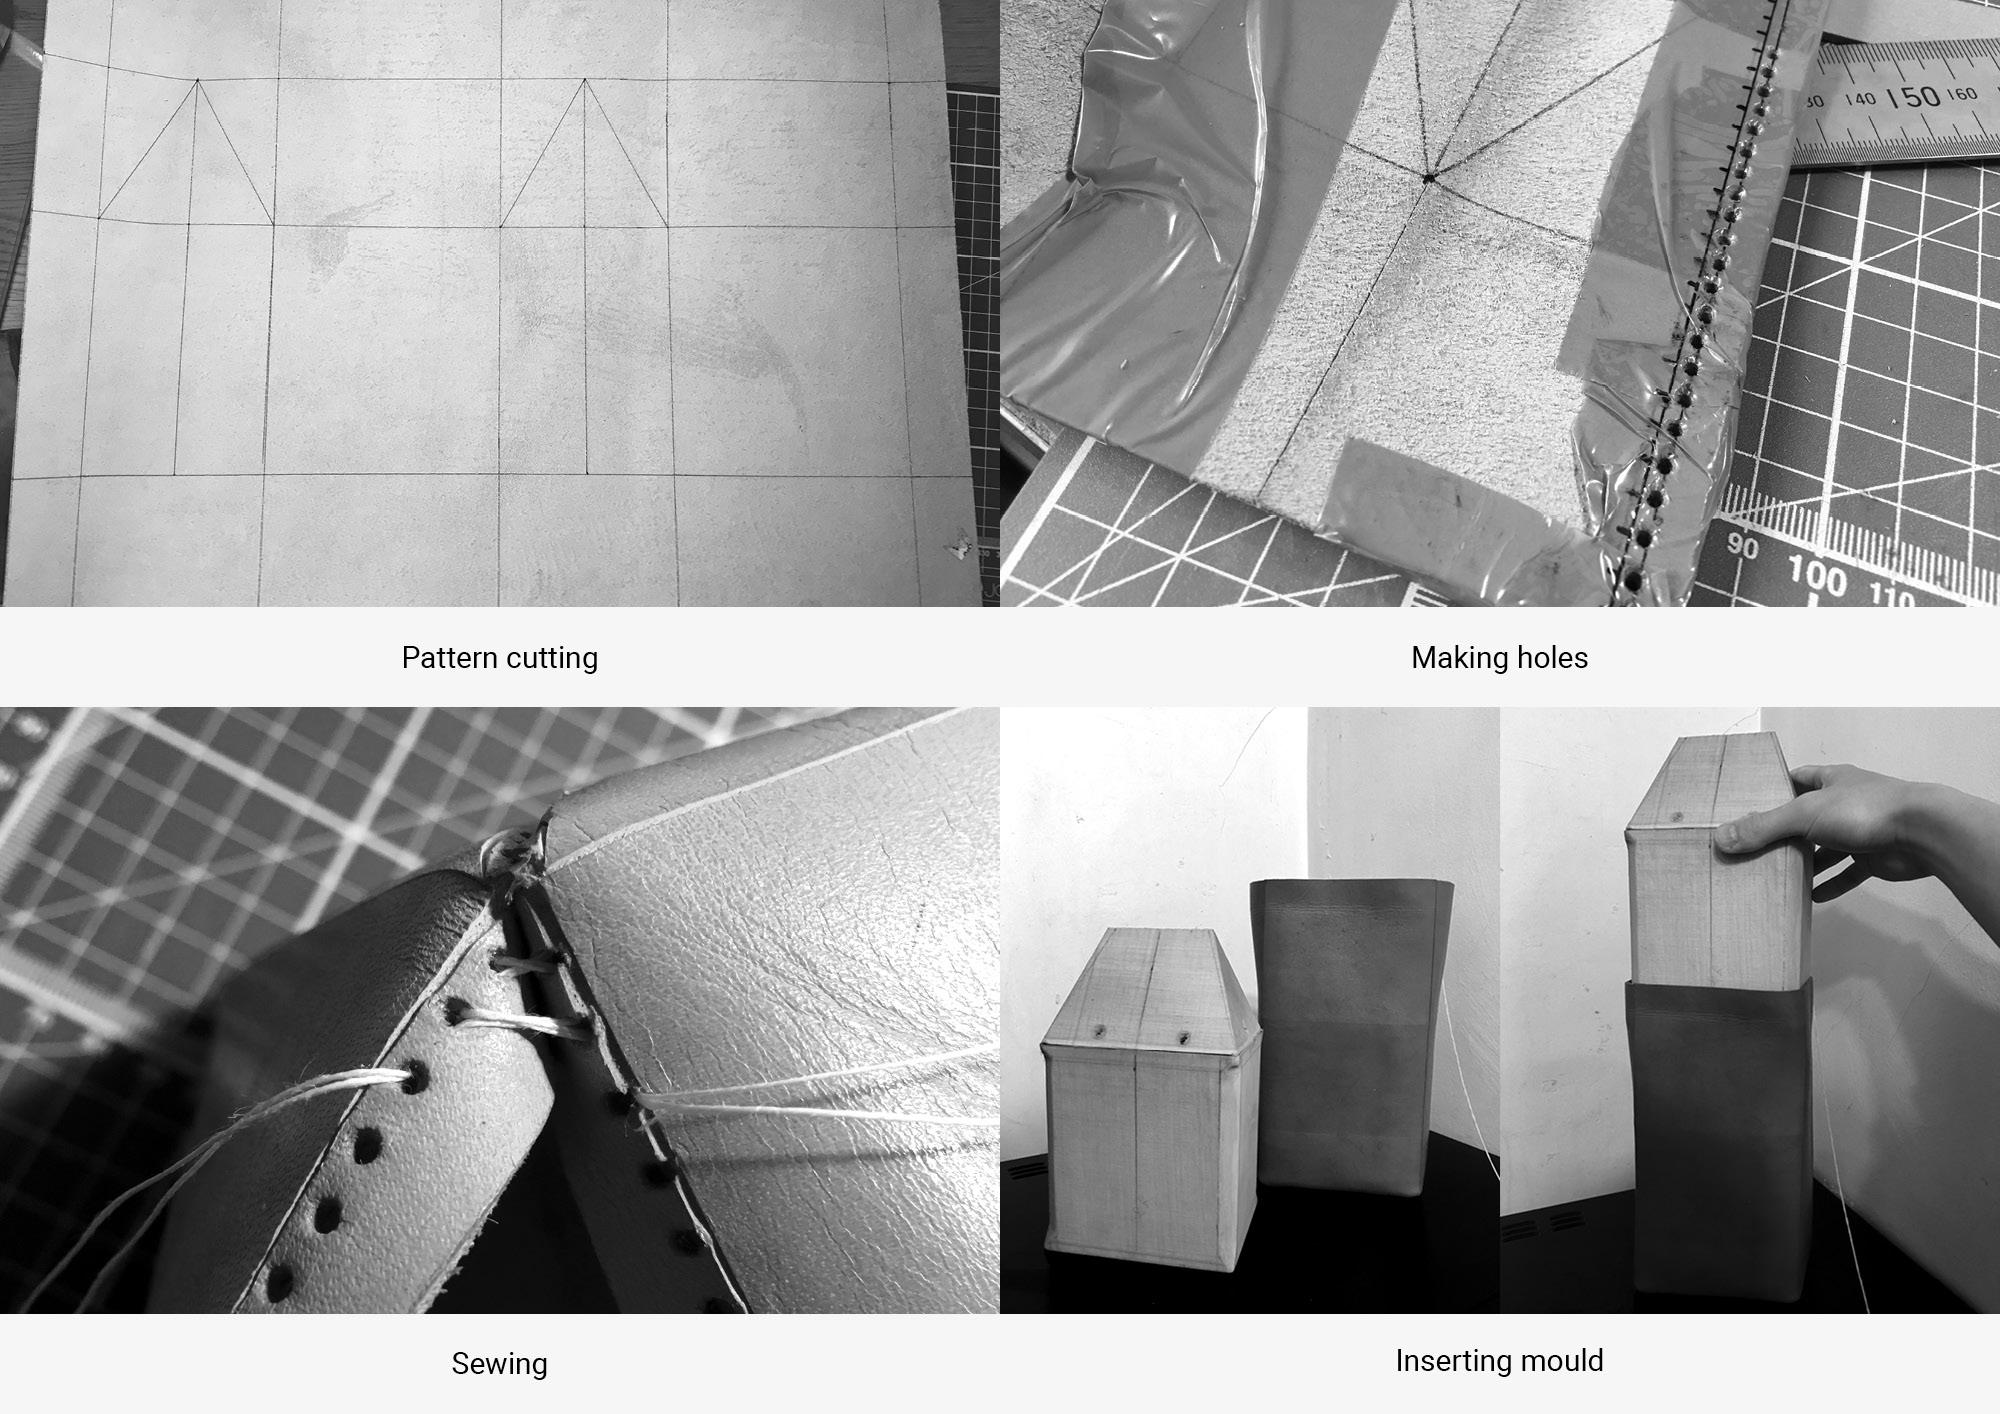 picpac-makingprocess.jpg